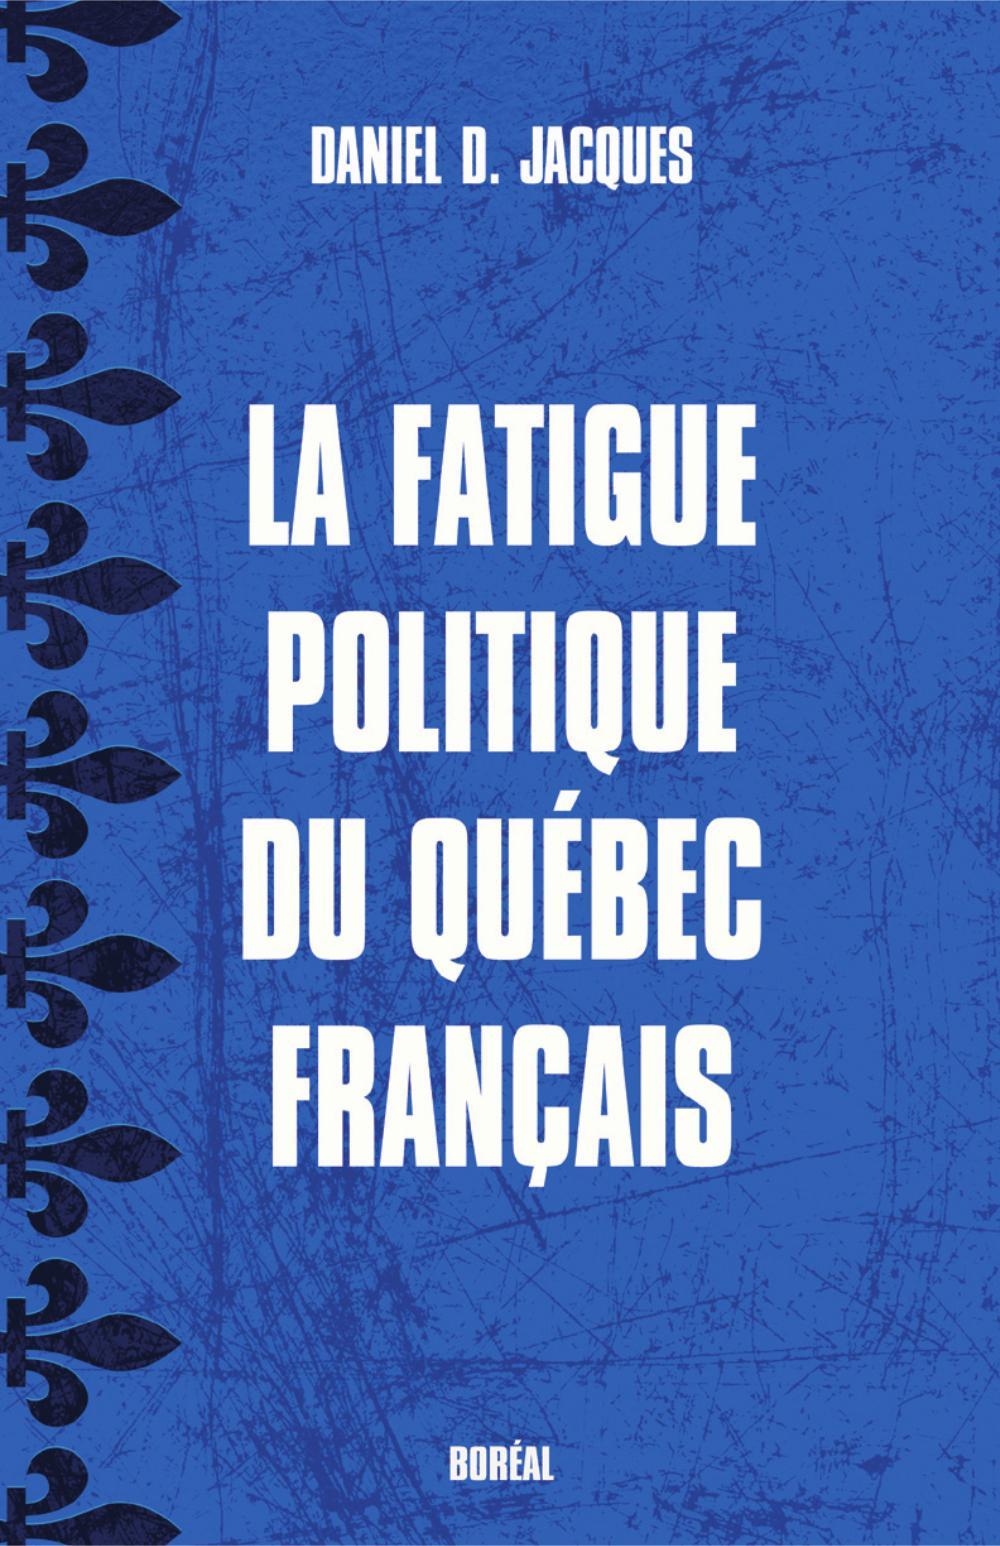 La Fatigue politique du Québec français